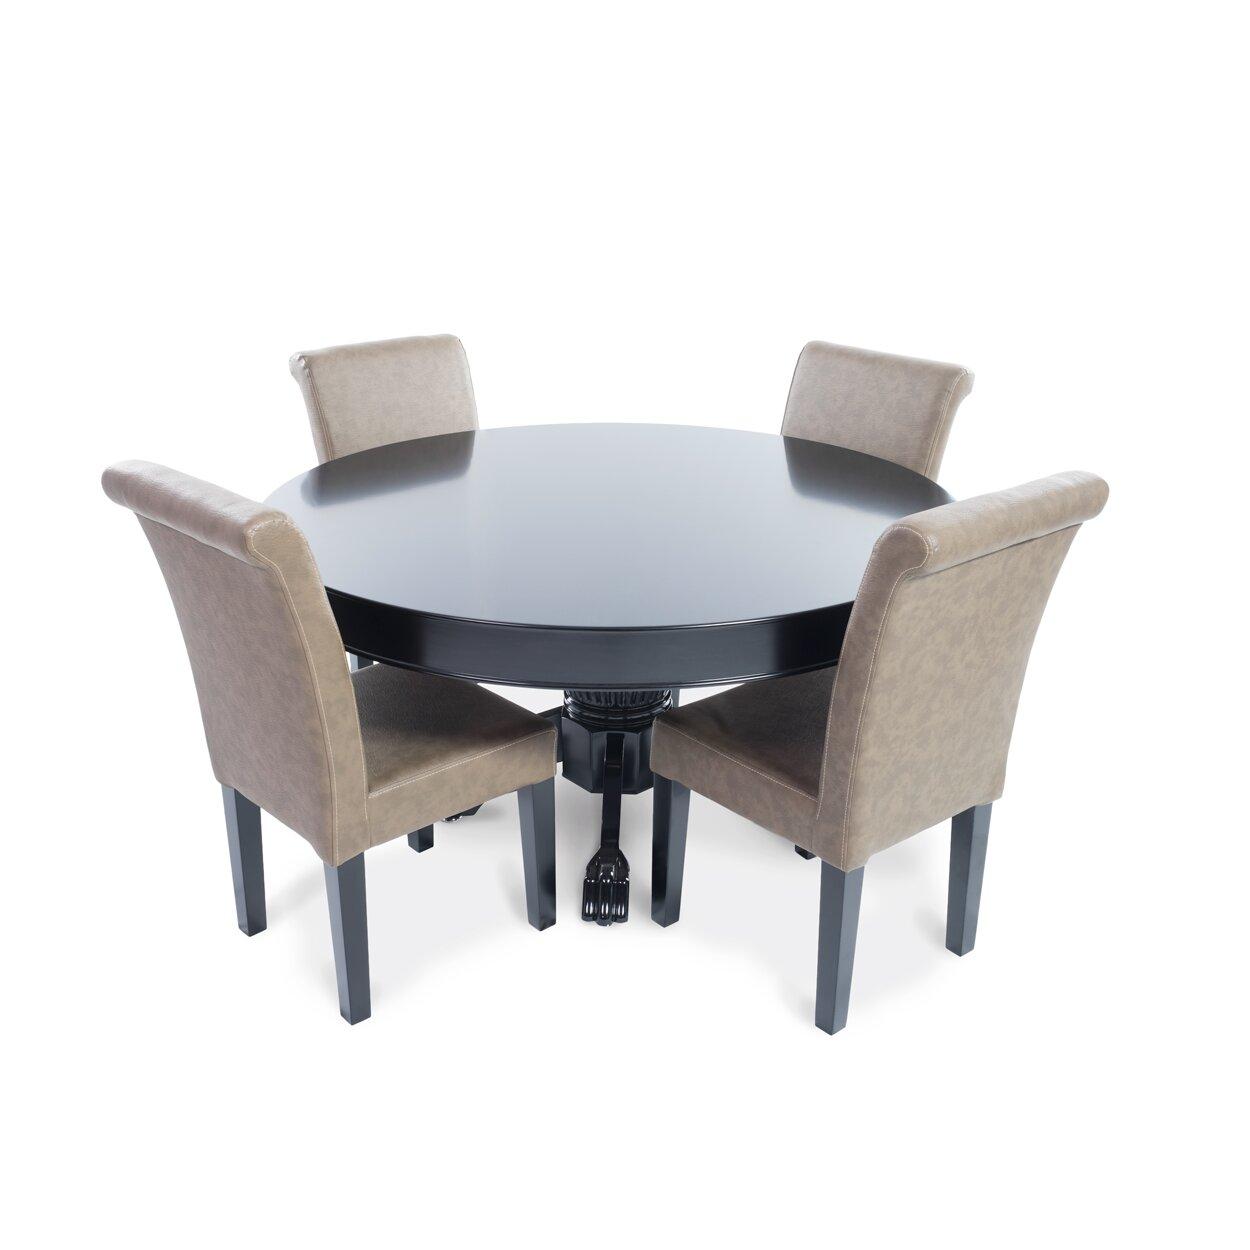 bbo poker nighthawk  piece poker dining table set  wayfair, Dining tables